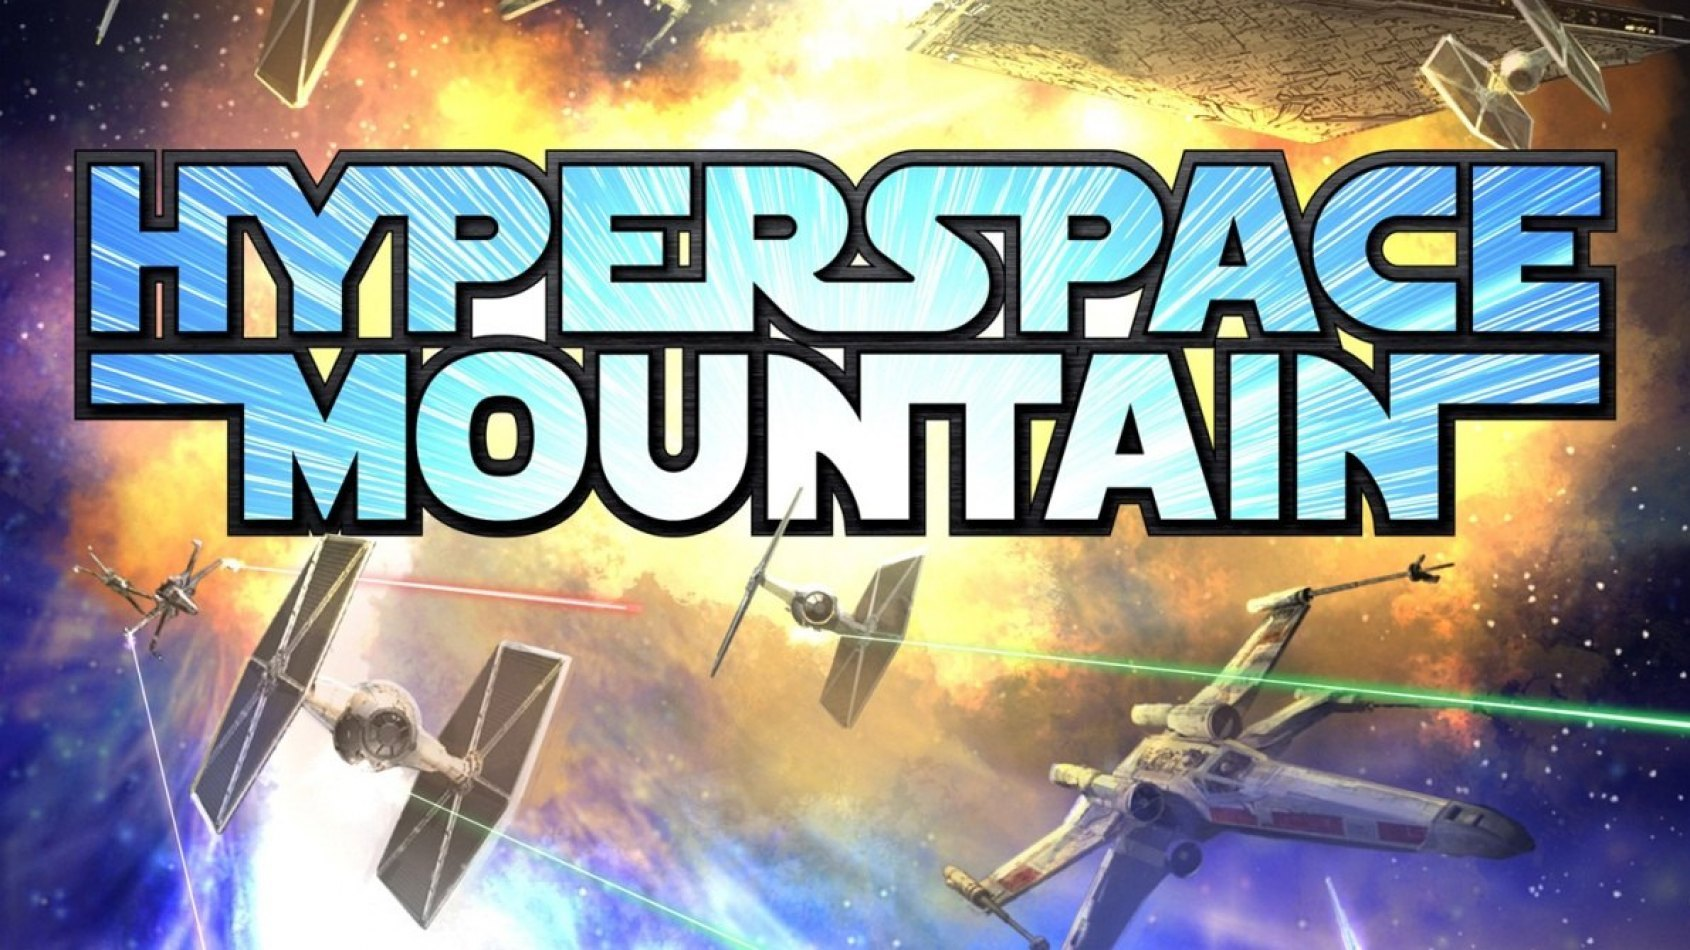 Hyperspace Mountain arrive � Disneyland Paris !